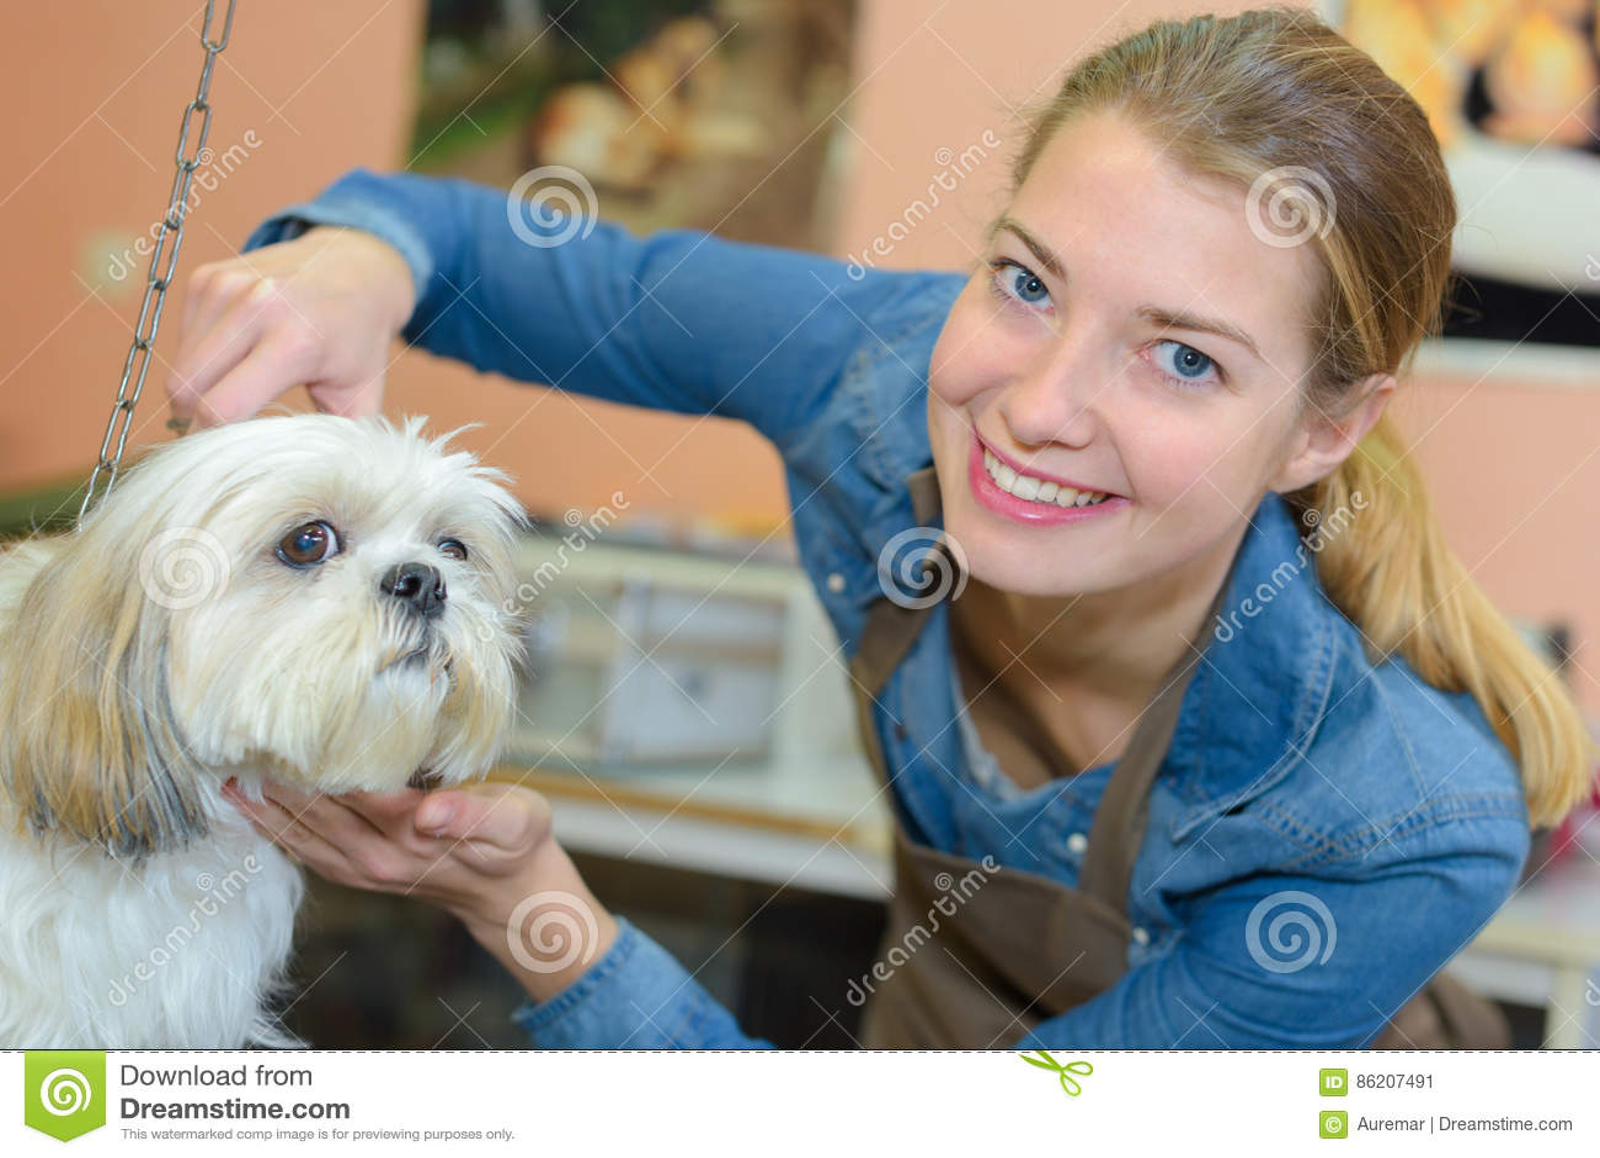 Dog getting hair cut in grooming salon